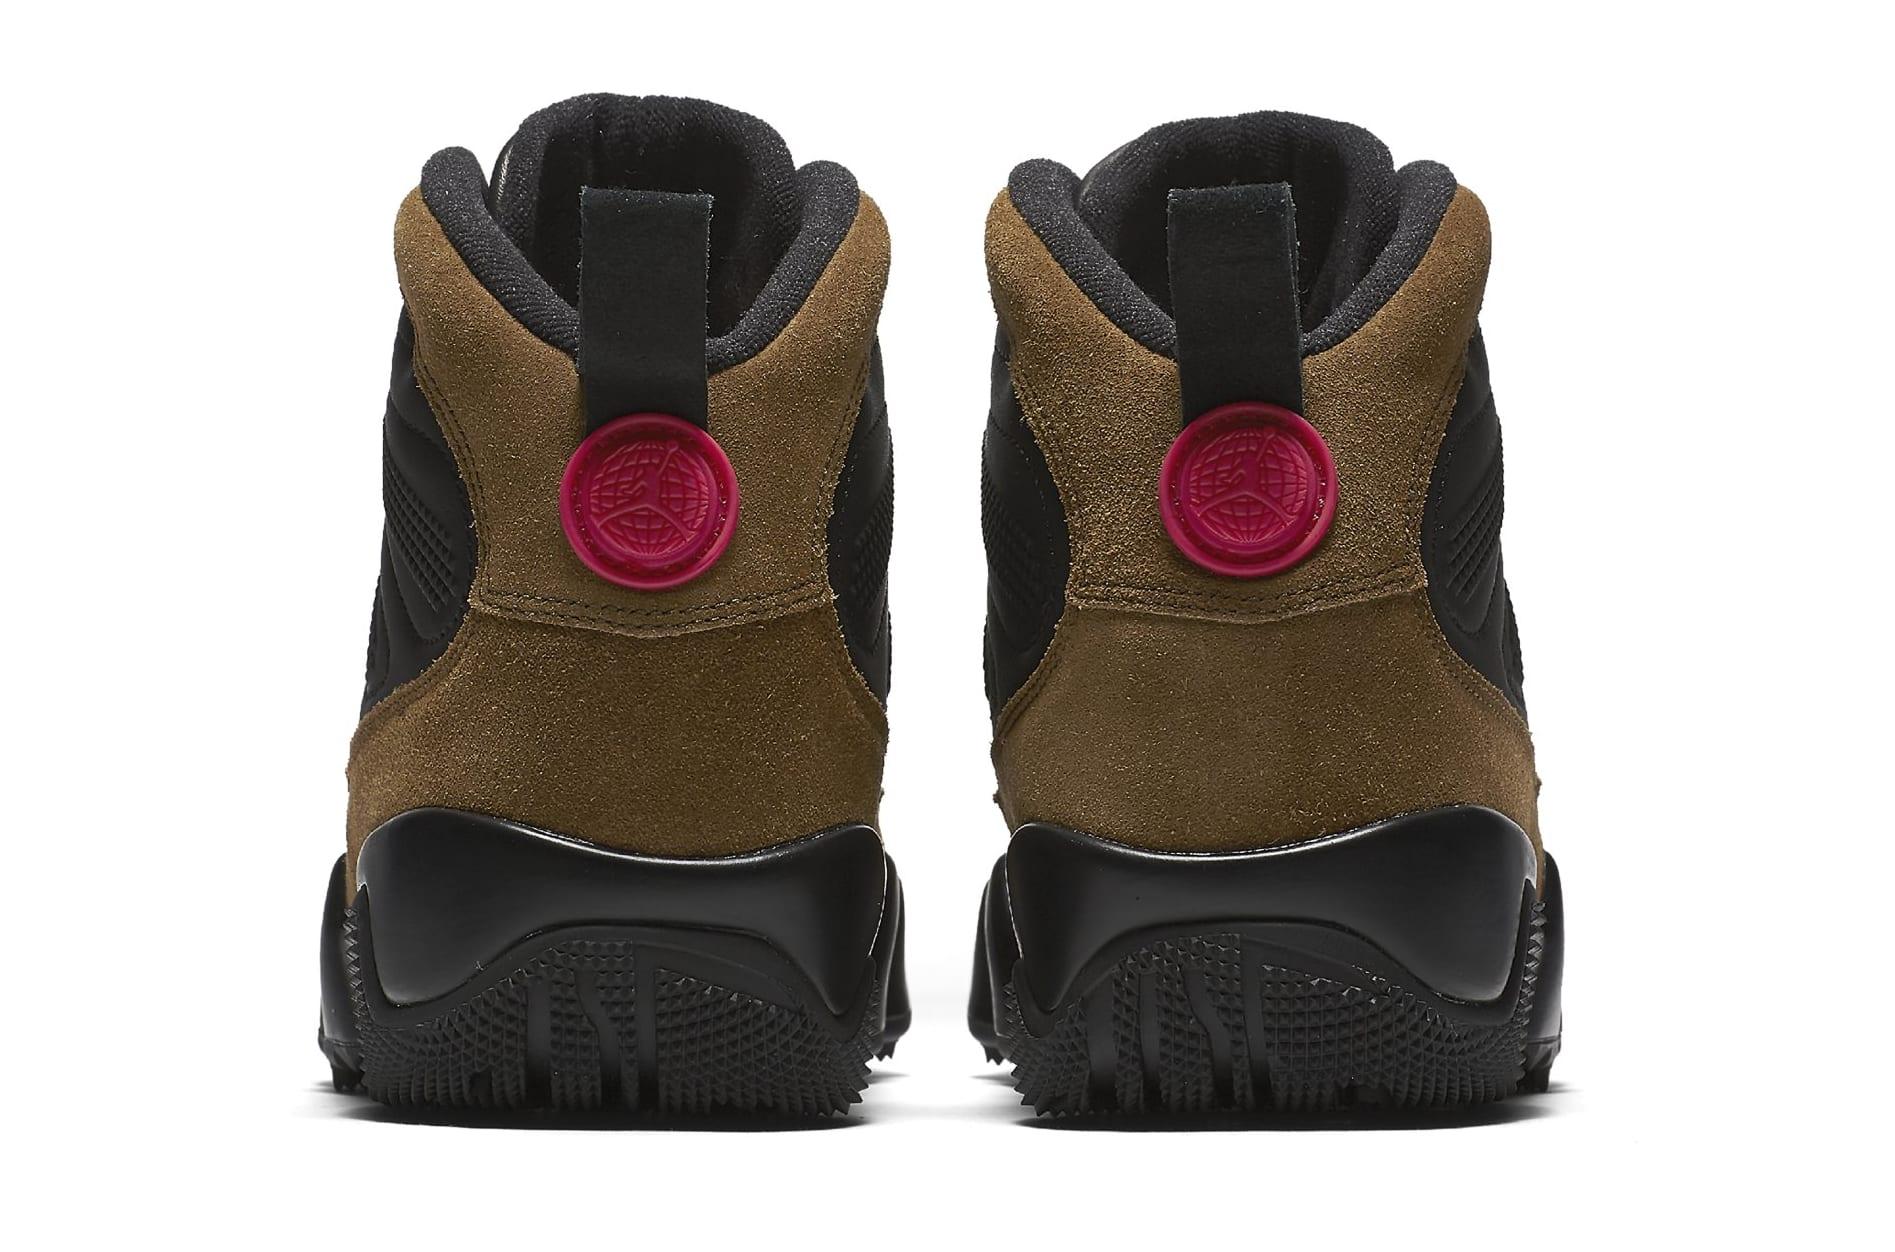 Air Jordan 9 NRG Boot 'Olive' AR4491-012 (Heel)